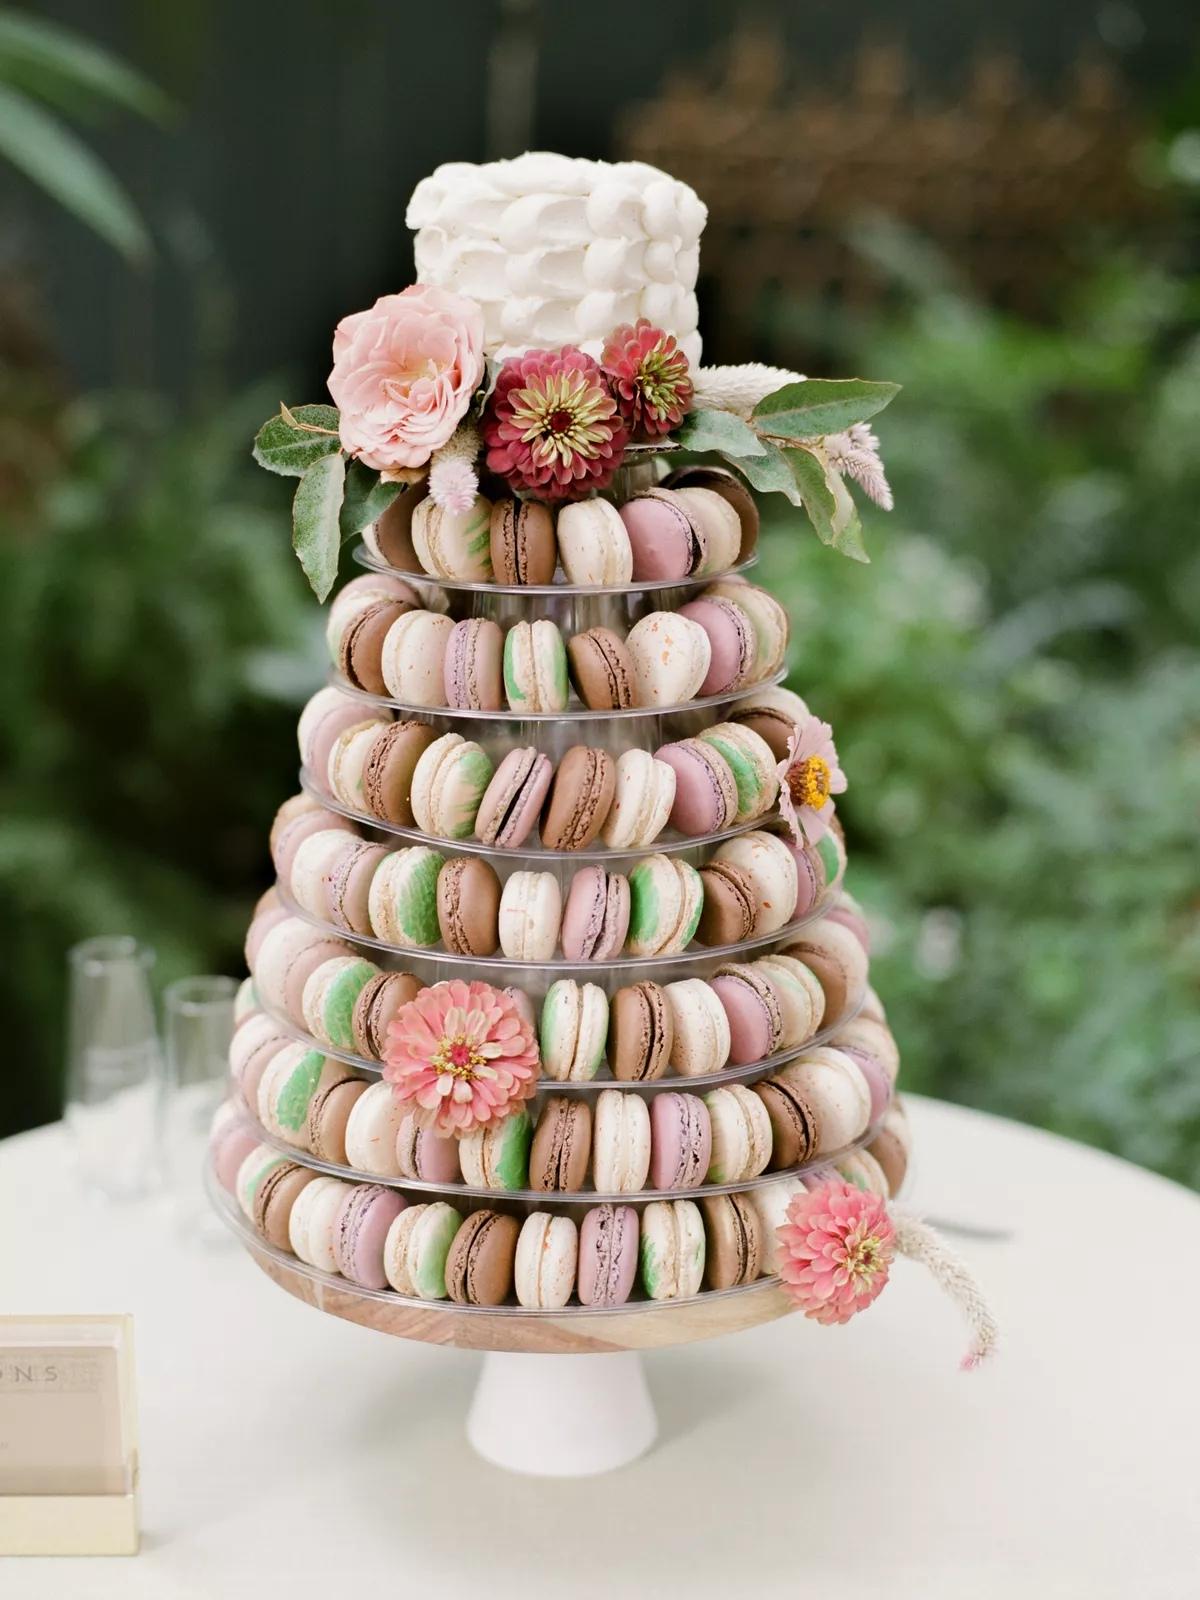 0Zot nabl7A - Маленькие свадебные торты